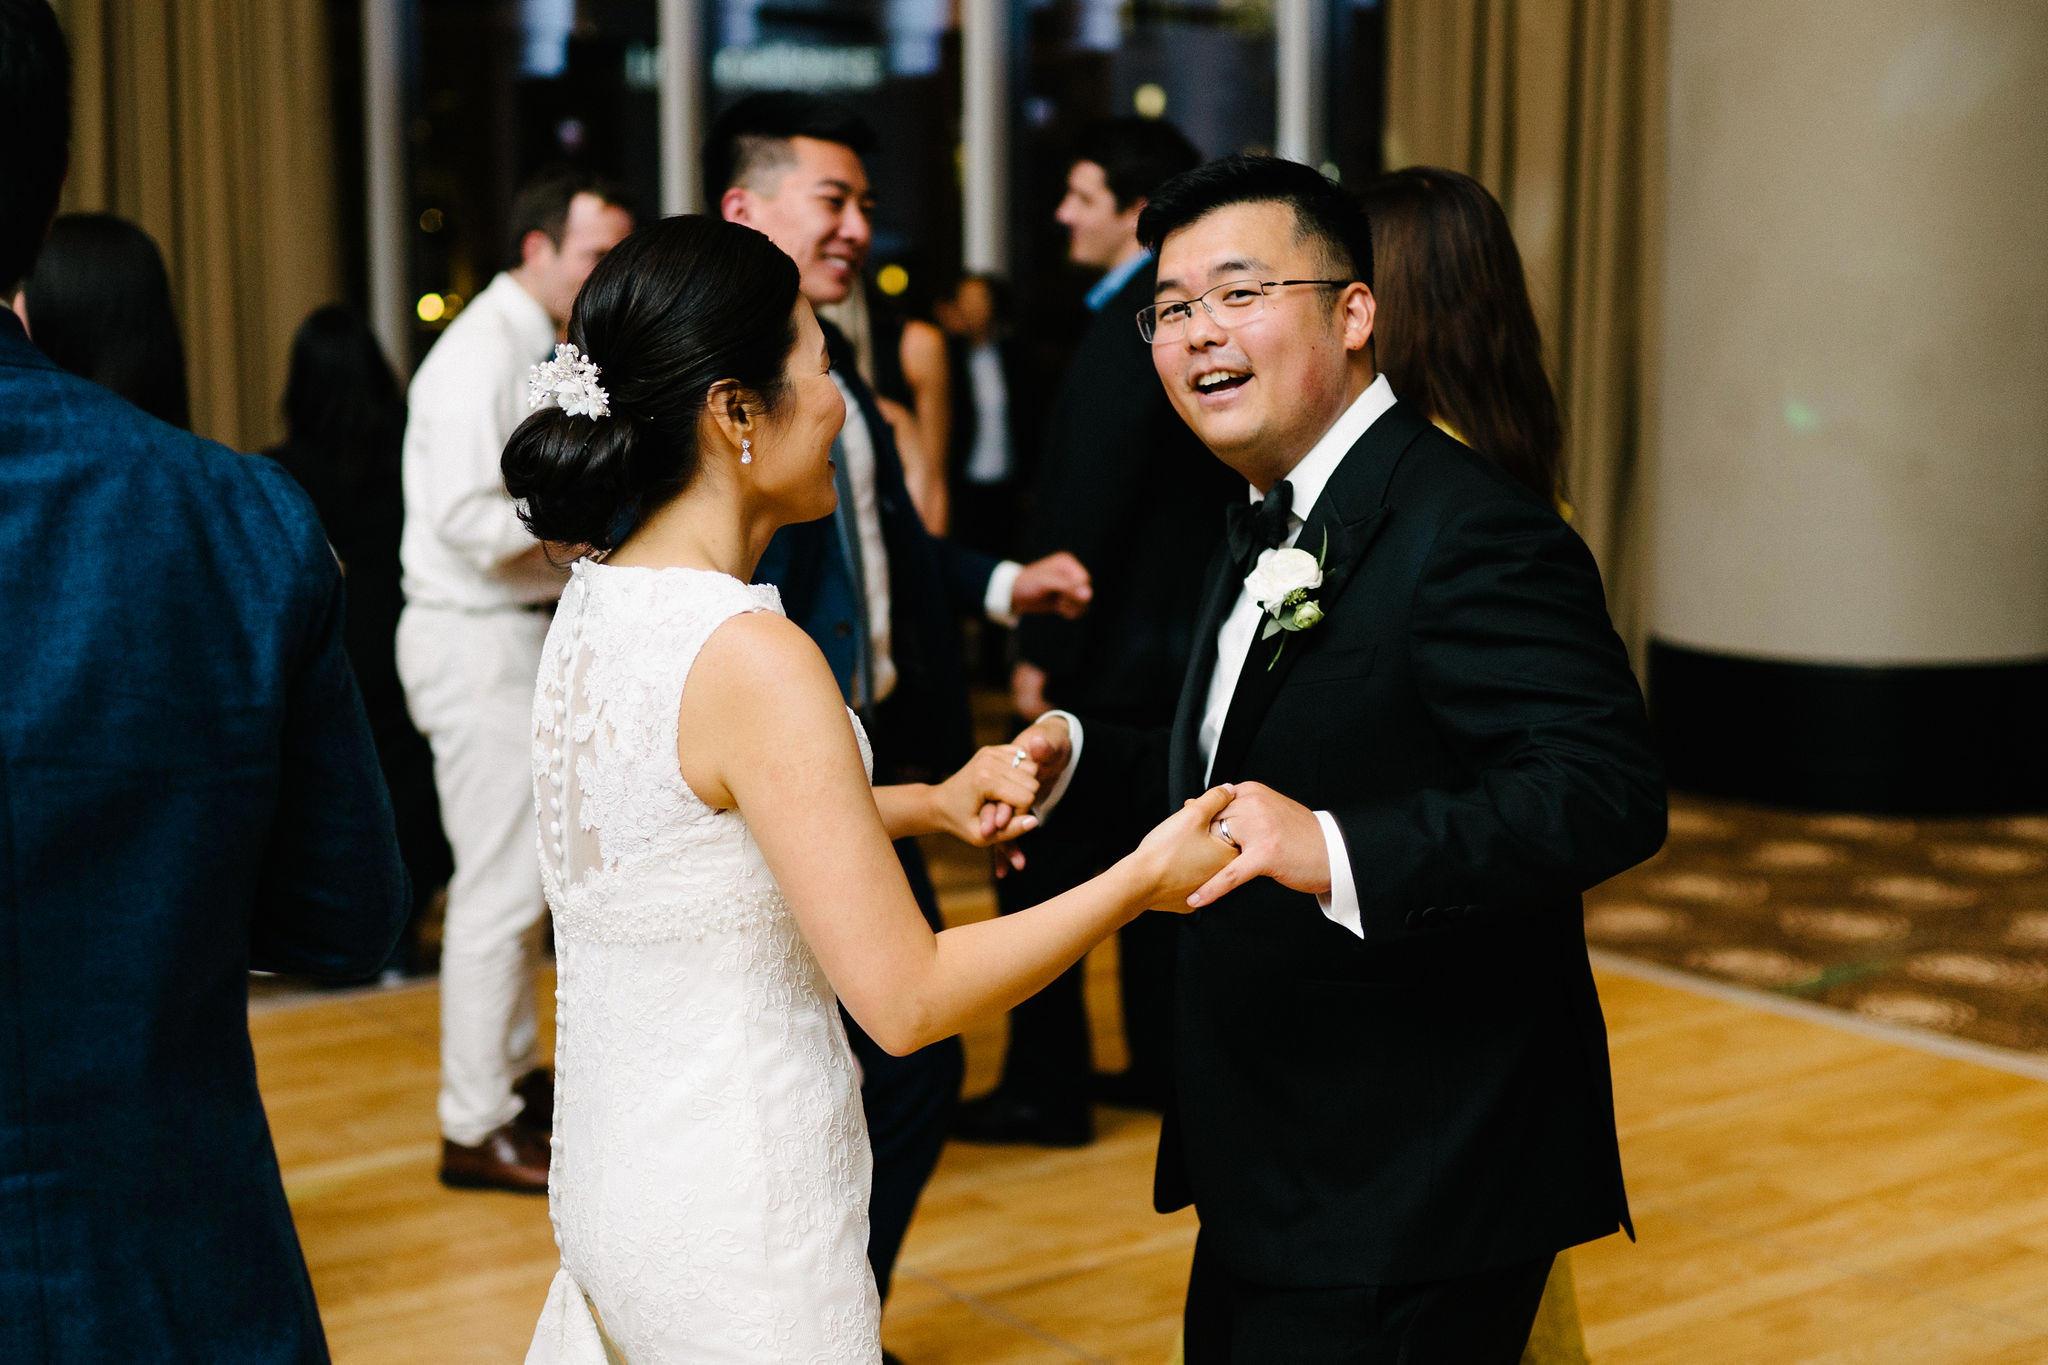 053-rempel-photography-chicago-wedding-inspiration-sara-philip-rockefeller-chapel-trump-tower.jpg